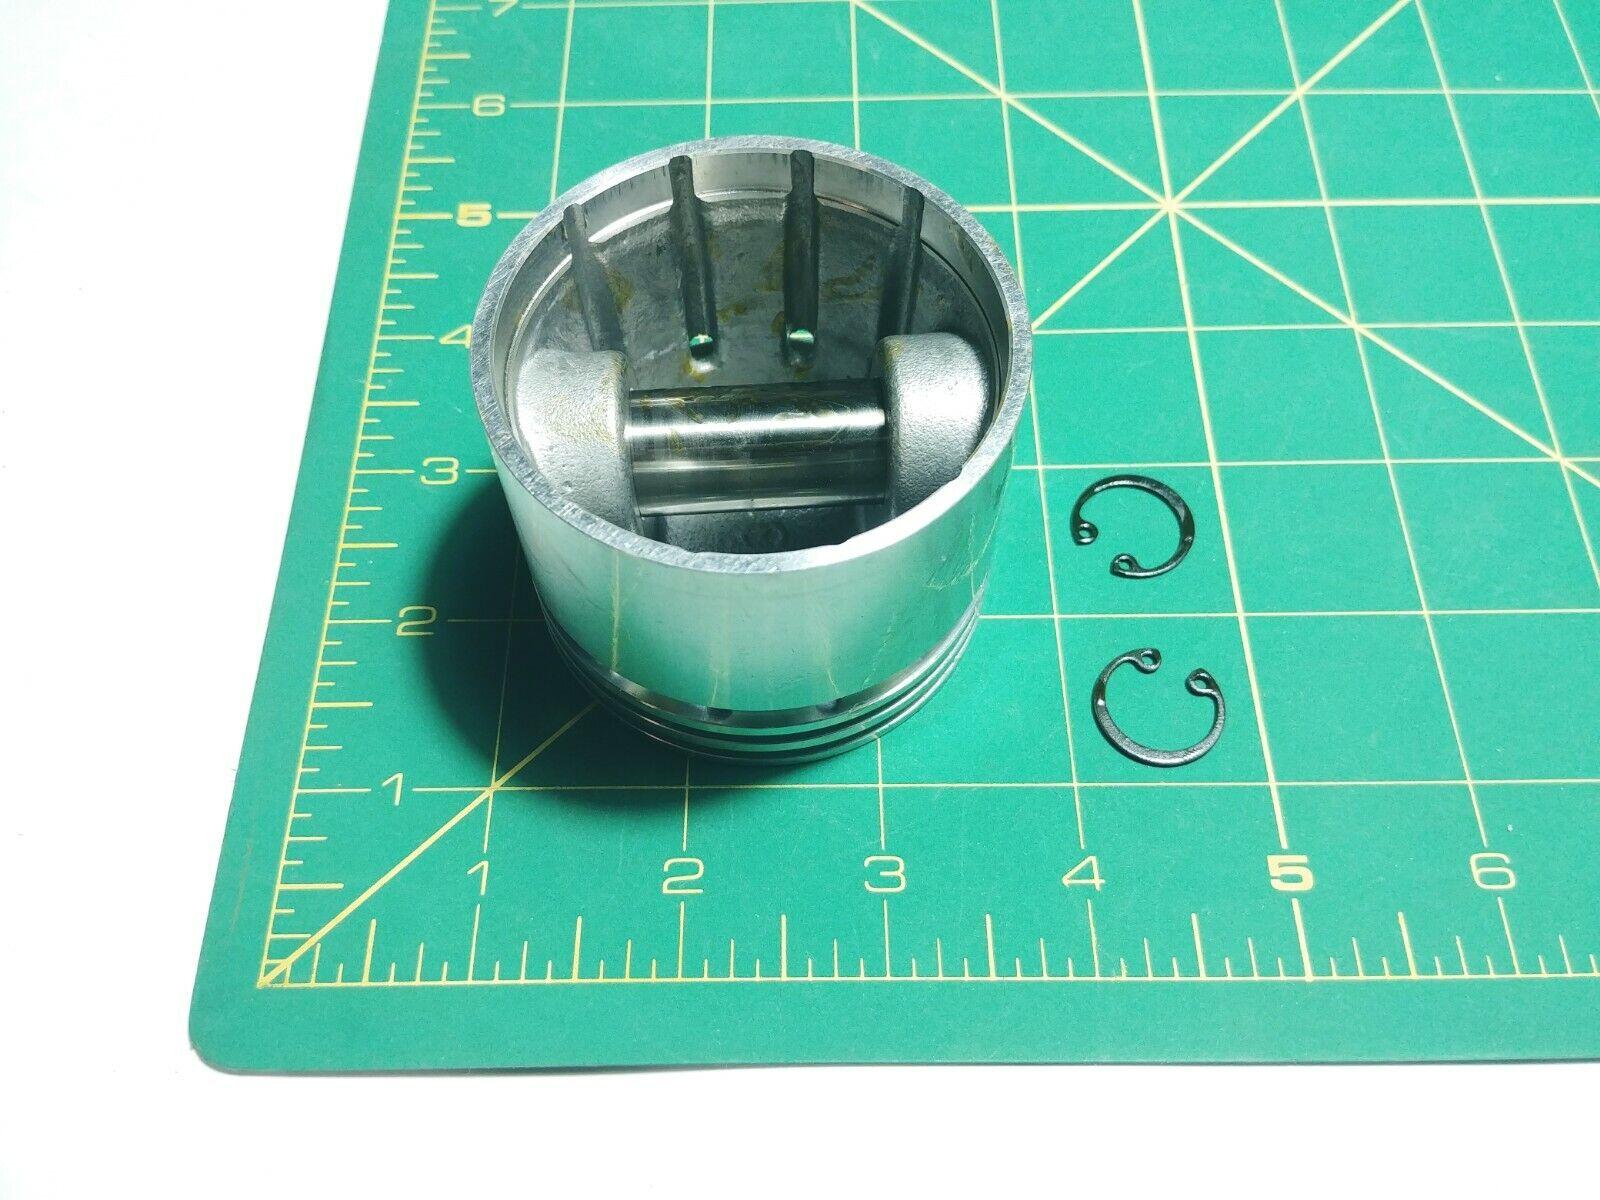 Genuine OEM DeWalt Compressor Parts Part Number 5140030-96 Piston